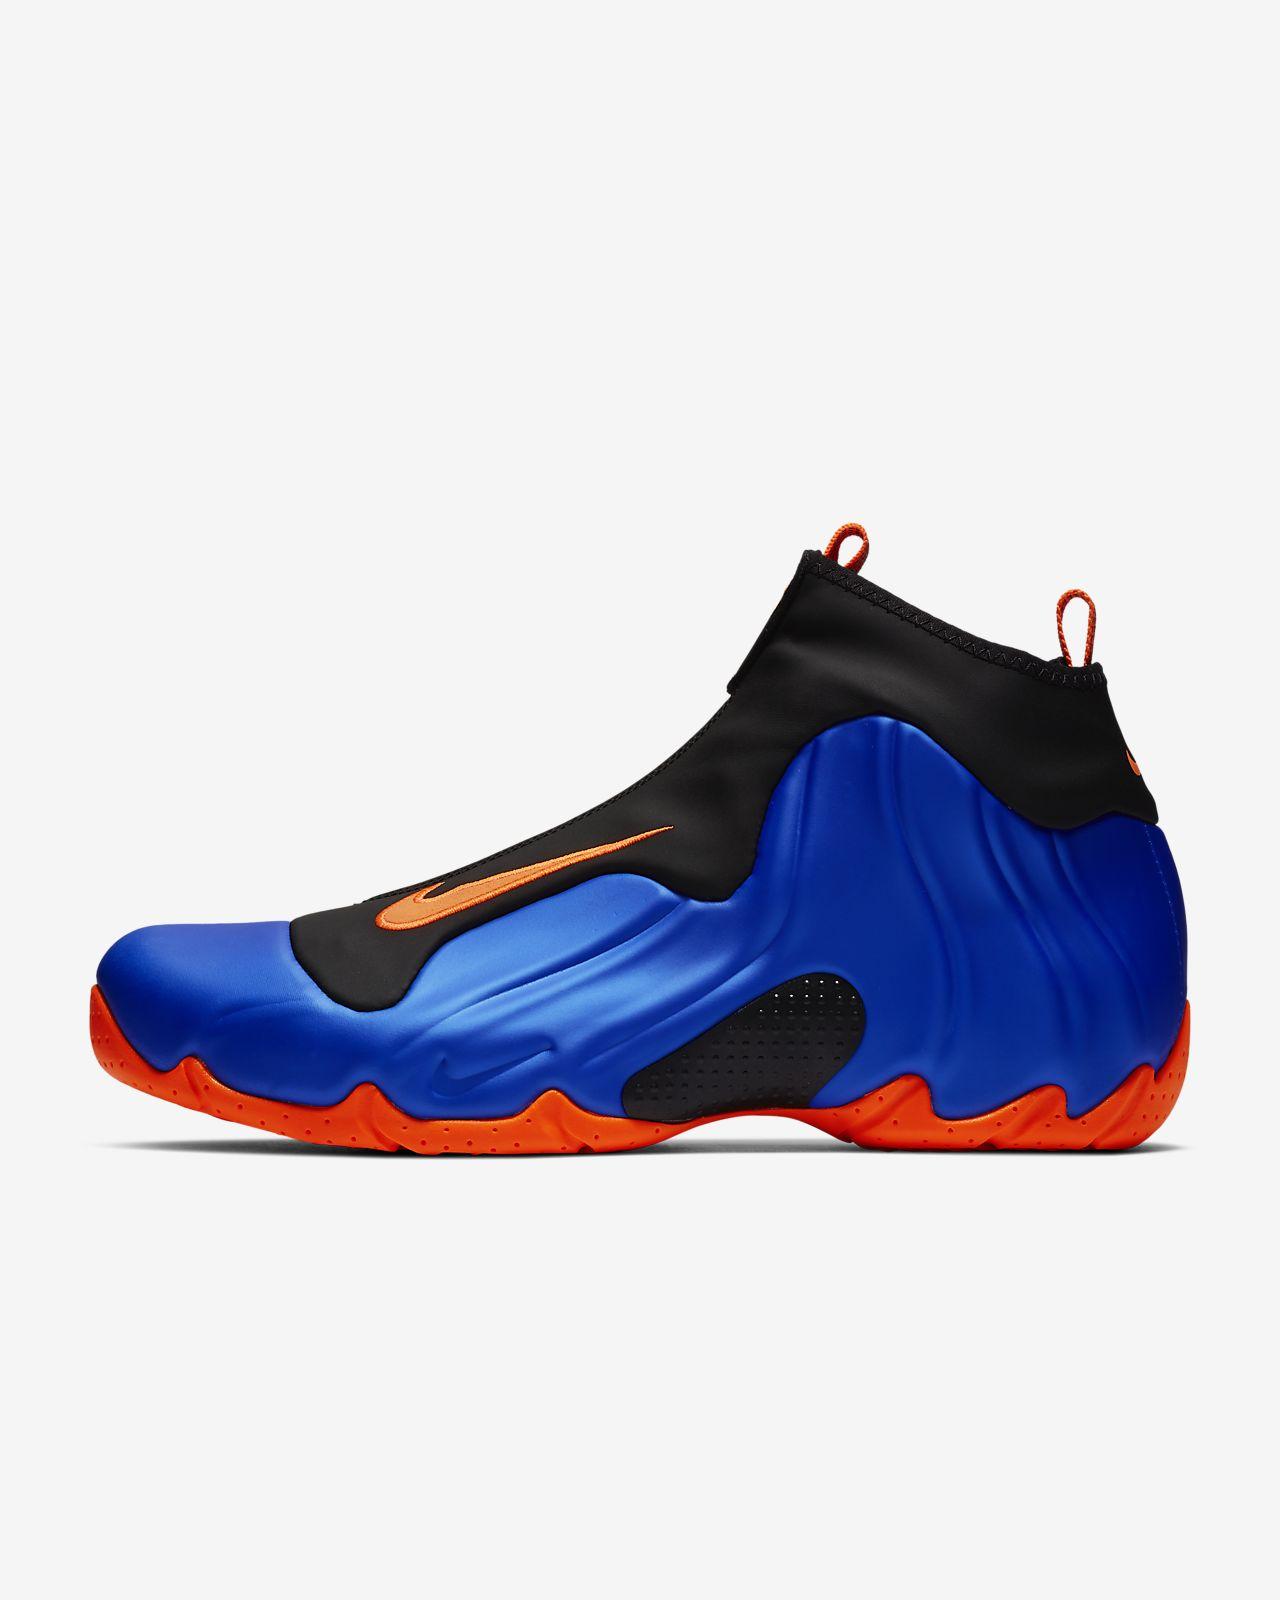 Nike Air Flightposite Men's Shoe